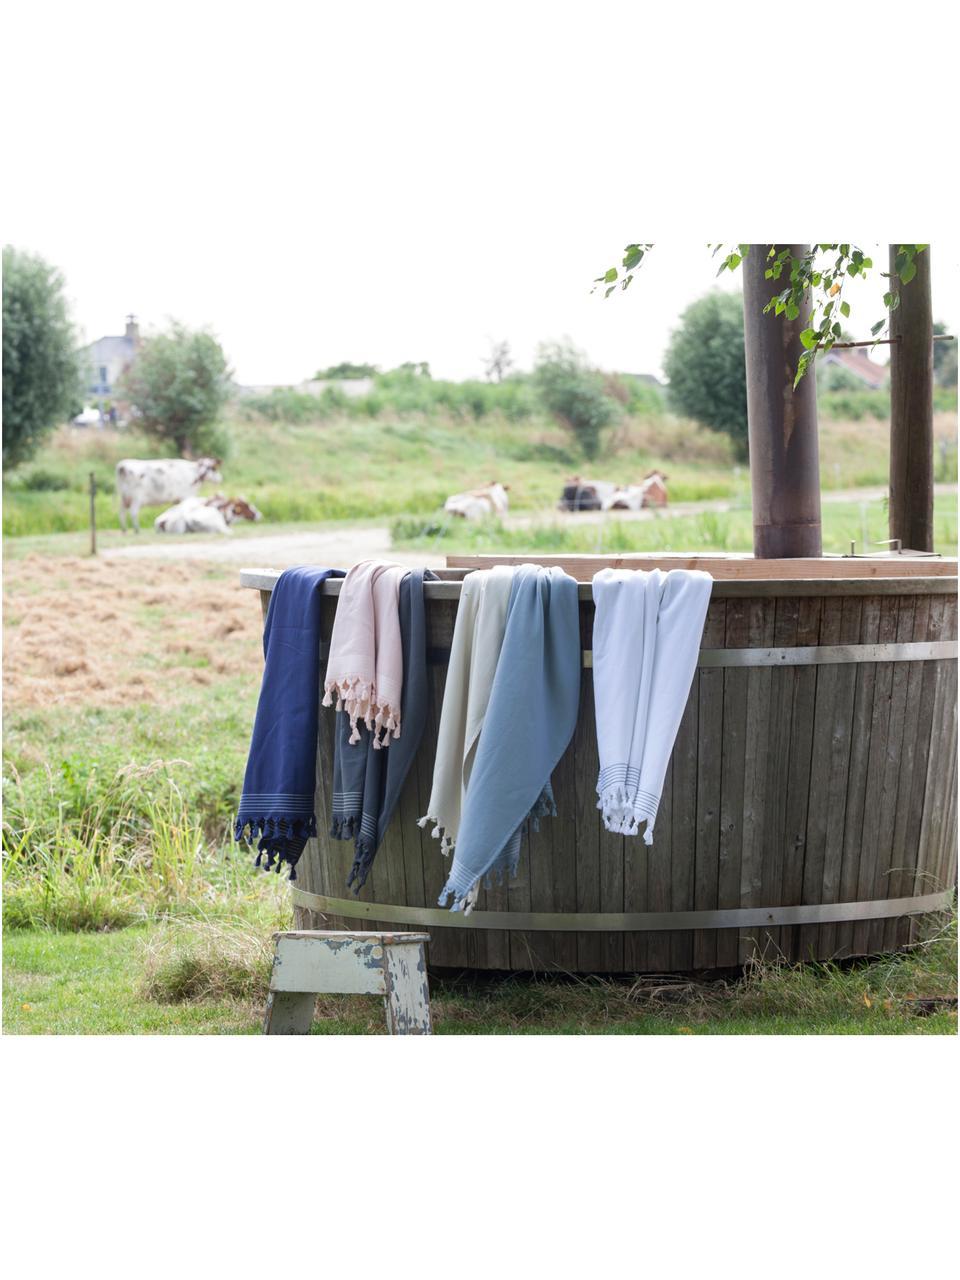 Telo mare Soft Cotton, Retro: Terry, Antracite, bianco, Larg. 100 x Lung. 180 cm